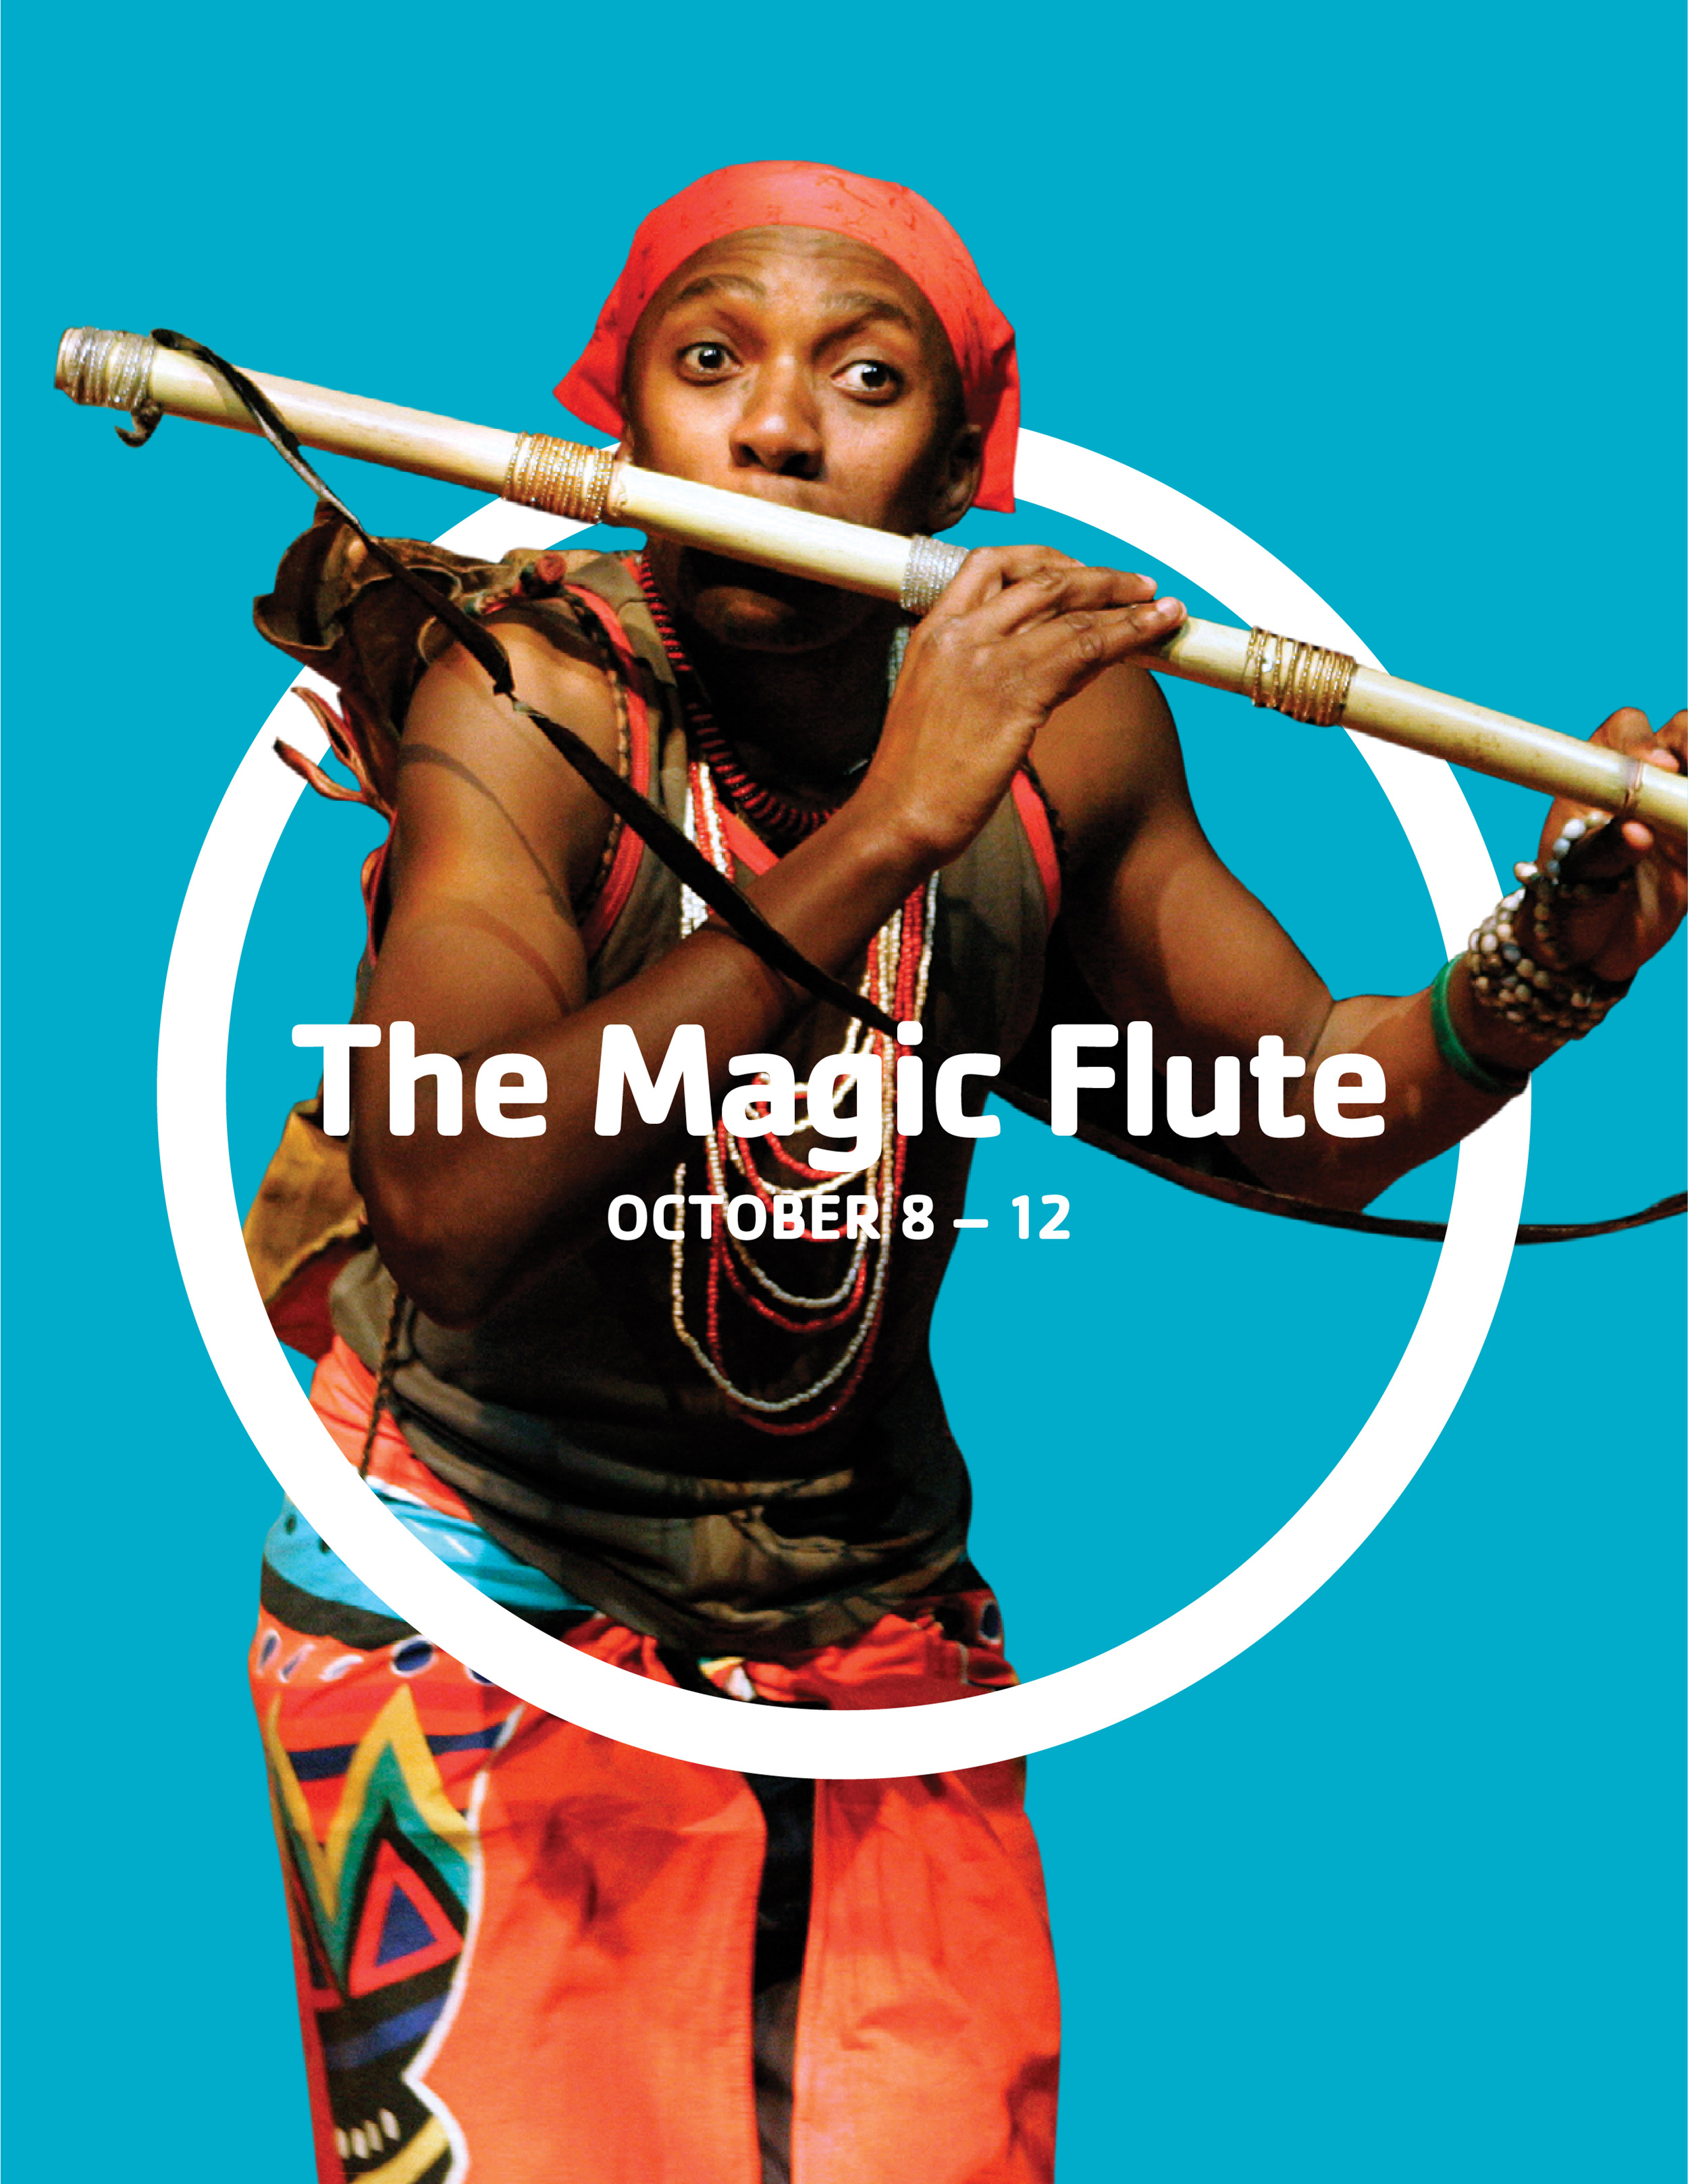 distinc_The_Broad_Stage_magic-flute.jpg